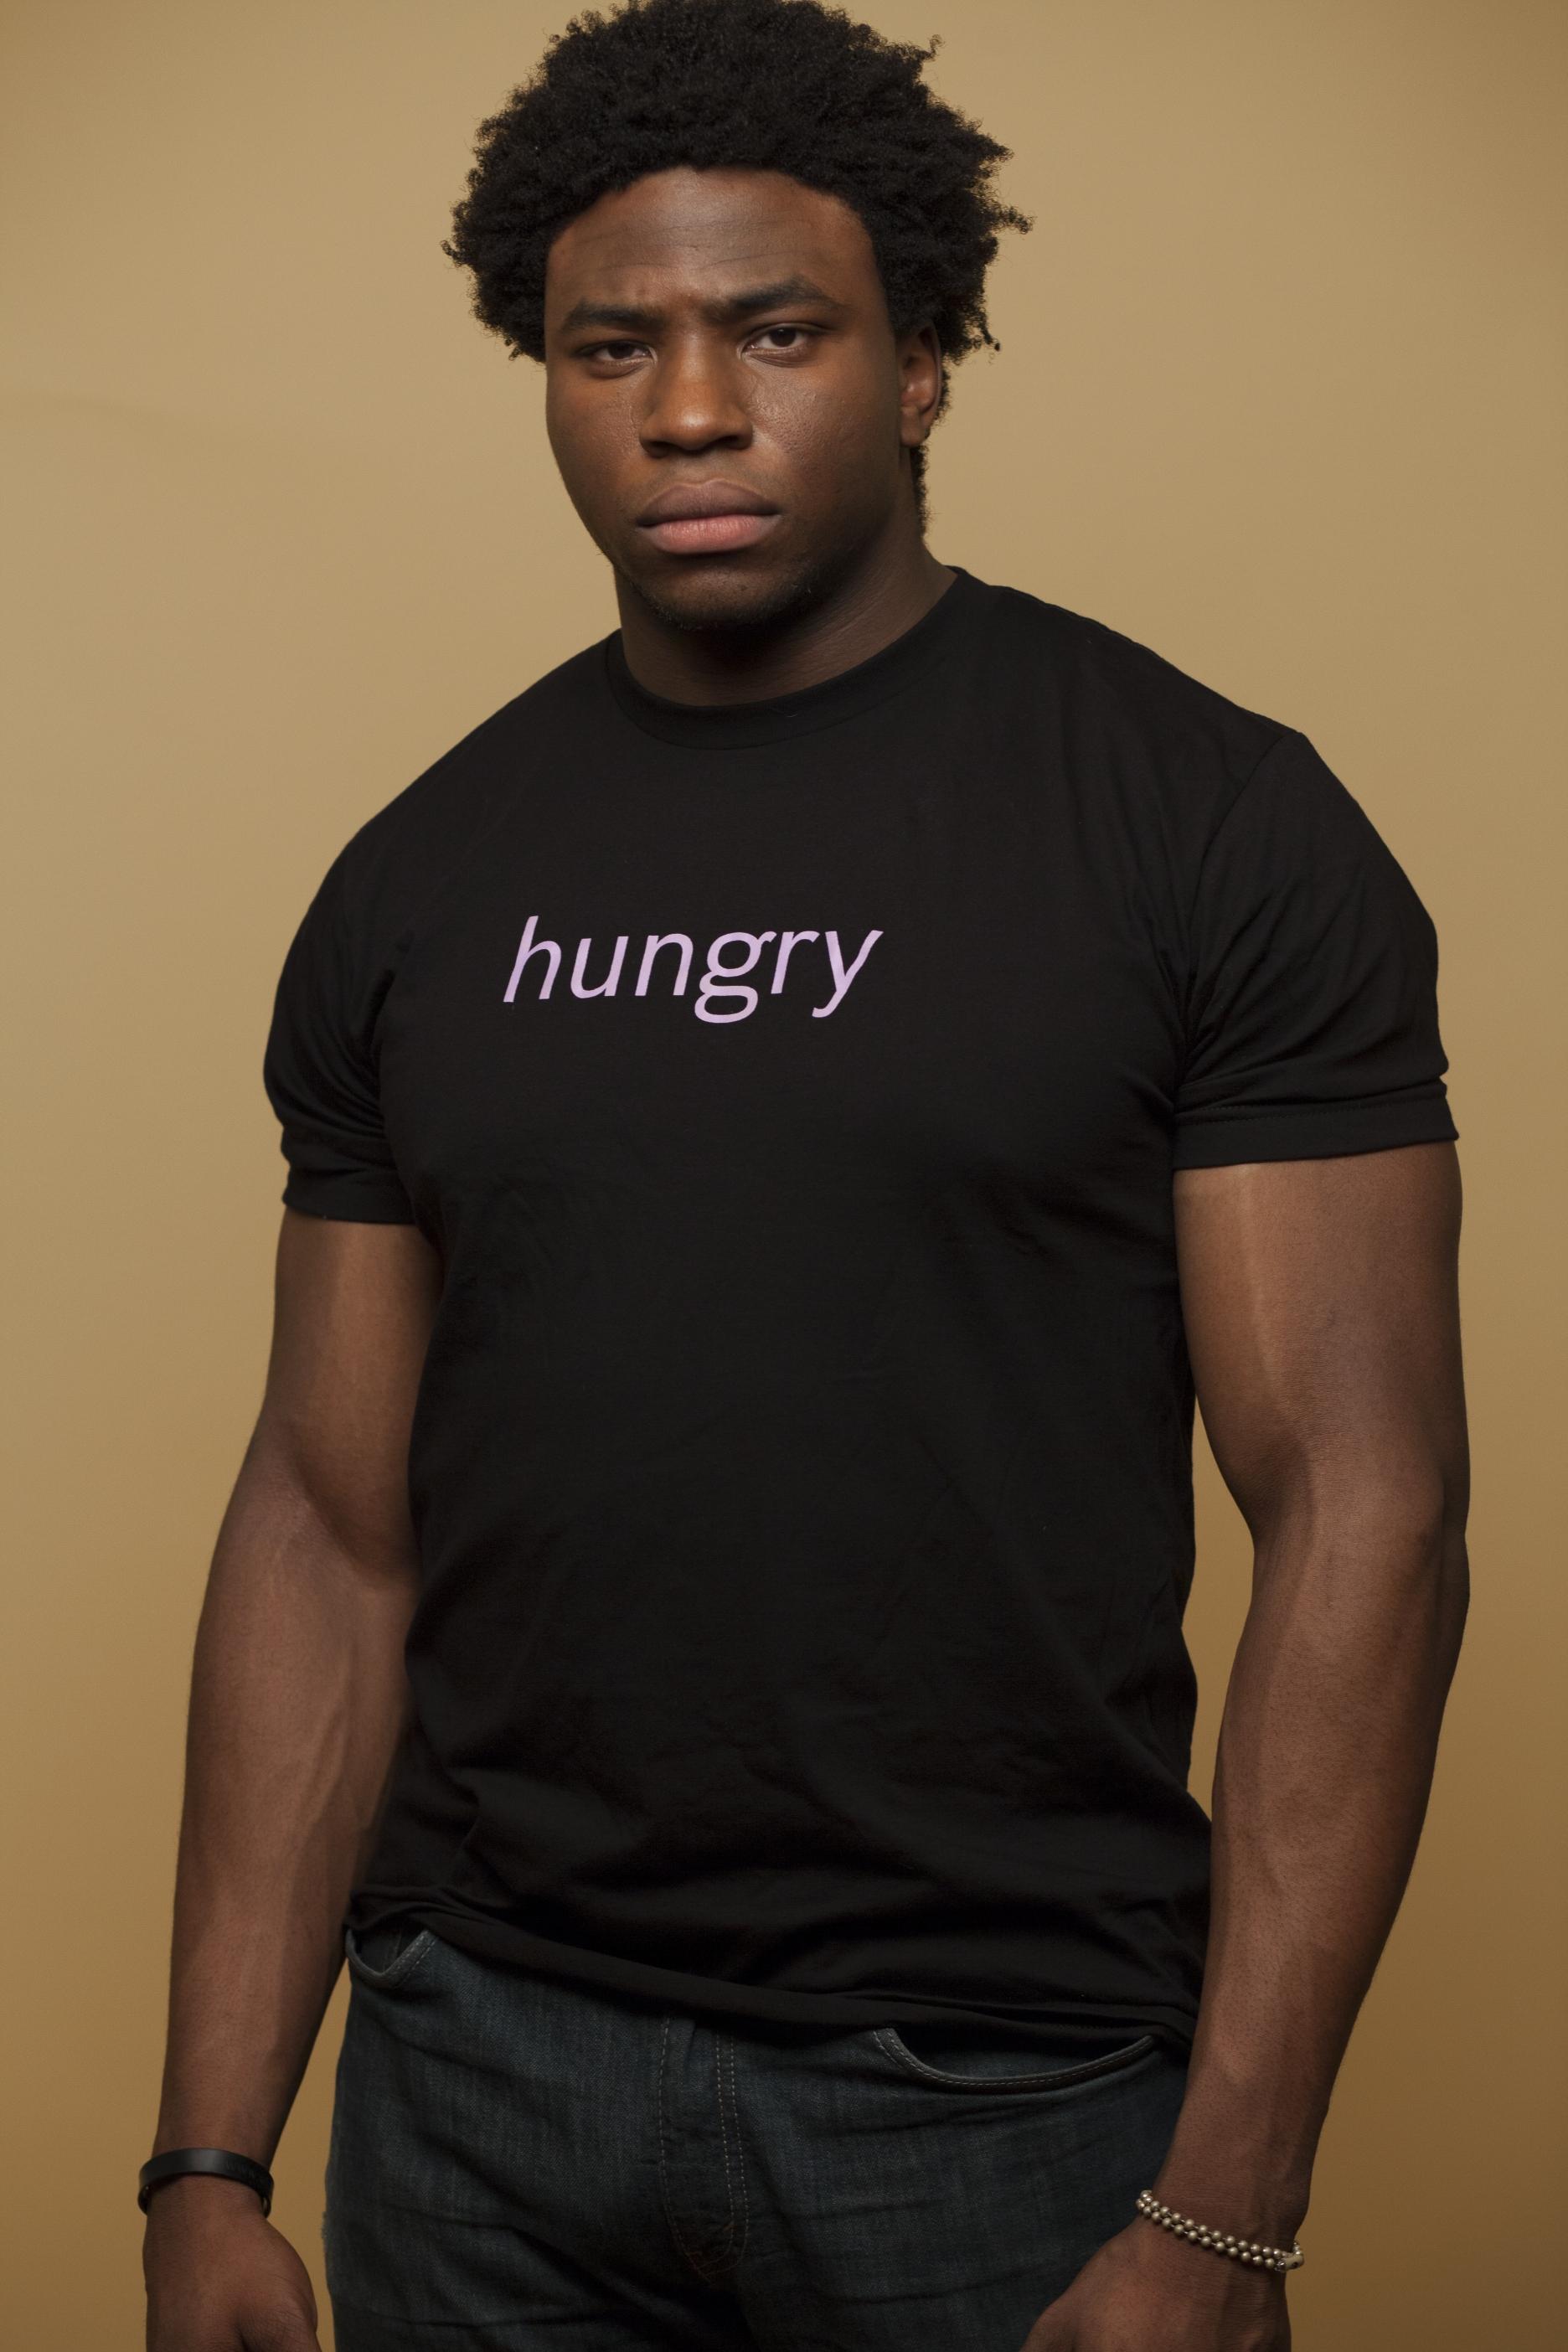 hungry-27.jpg